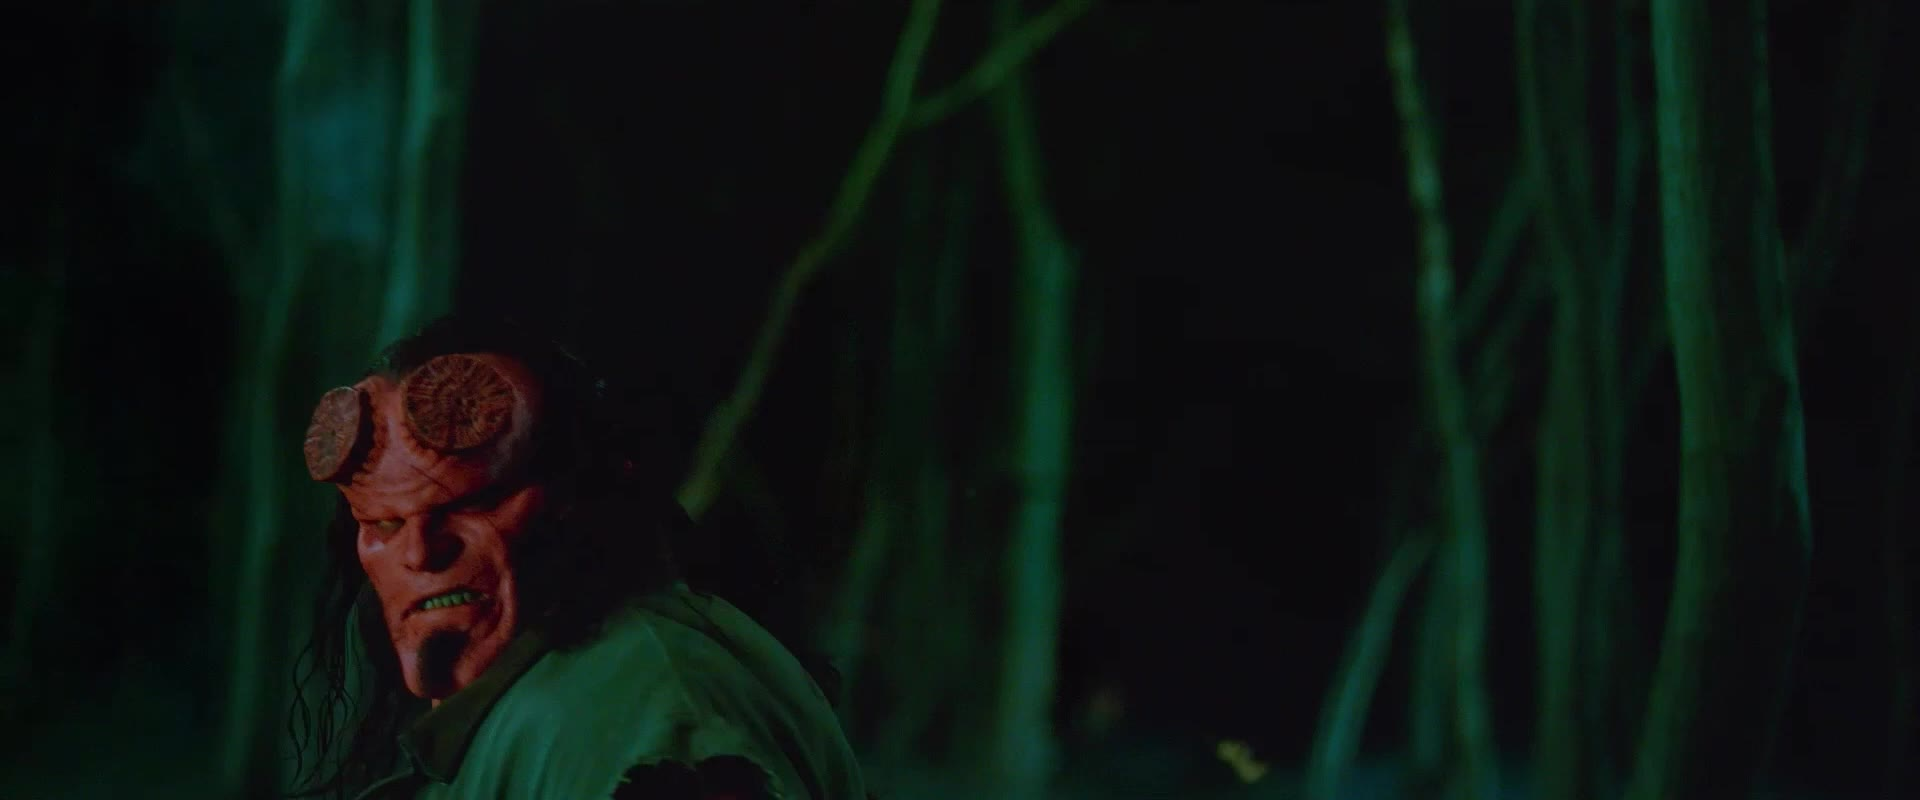 david harbour, gun, hellboy, hellboy 2019, hellboy movie, shots fired, superhero, superheroes, Hellboy Gun Shots Fired GIFs